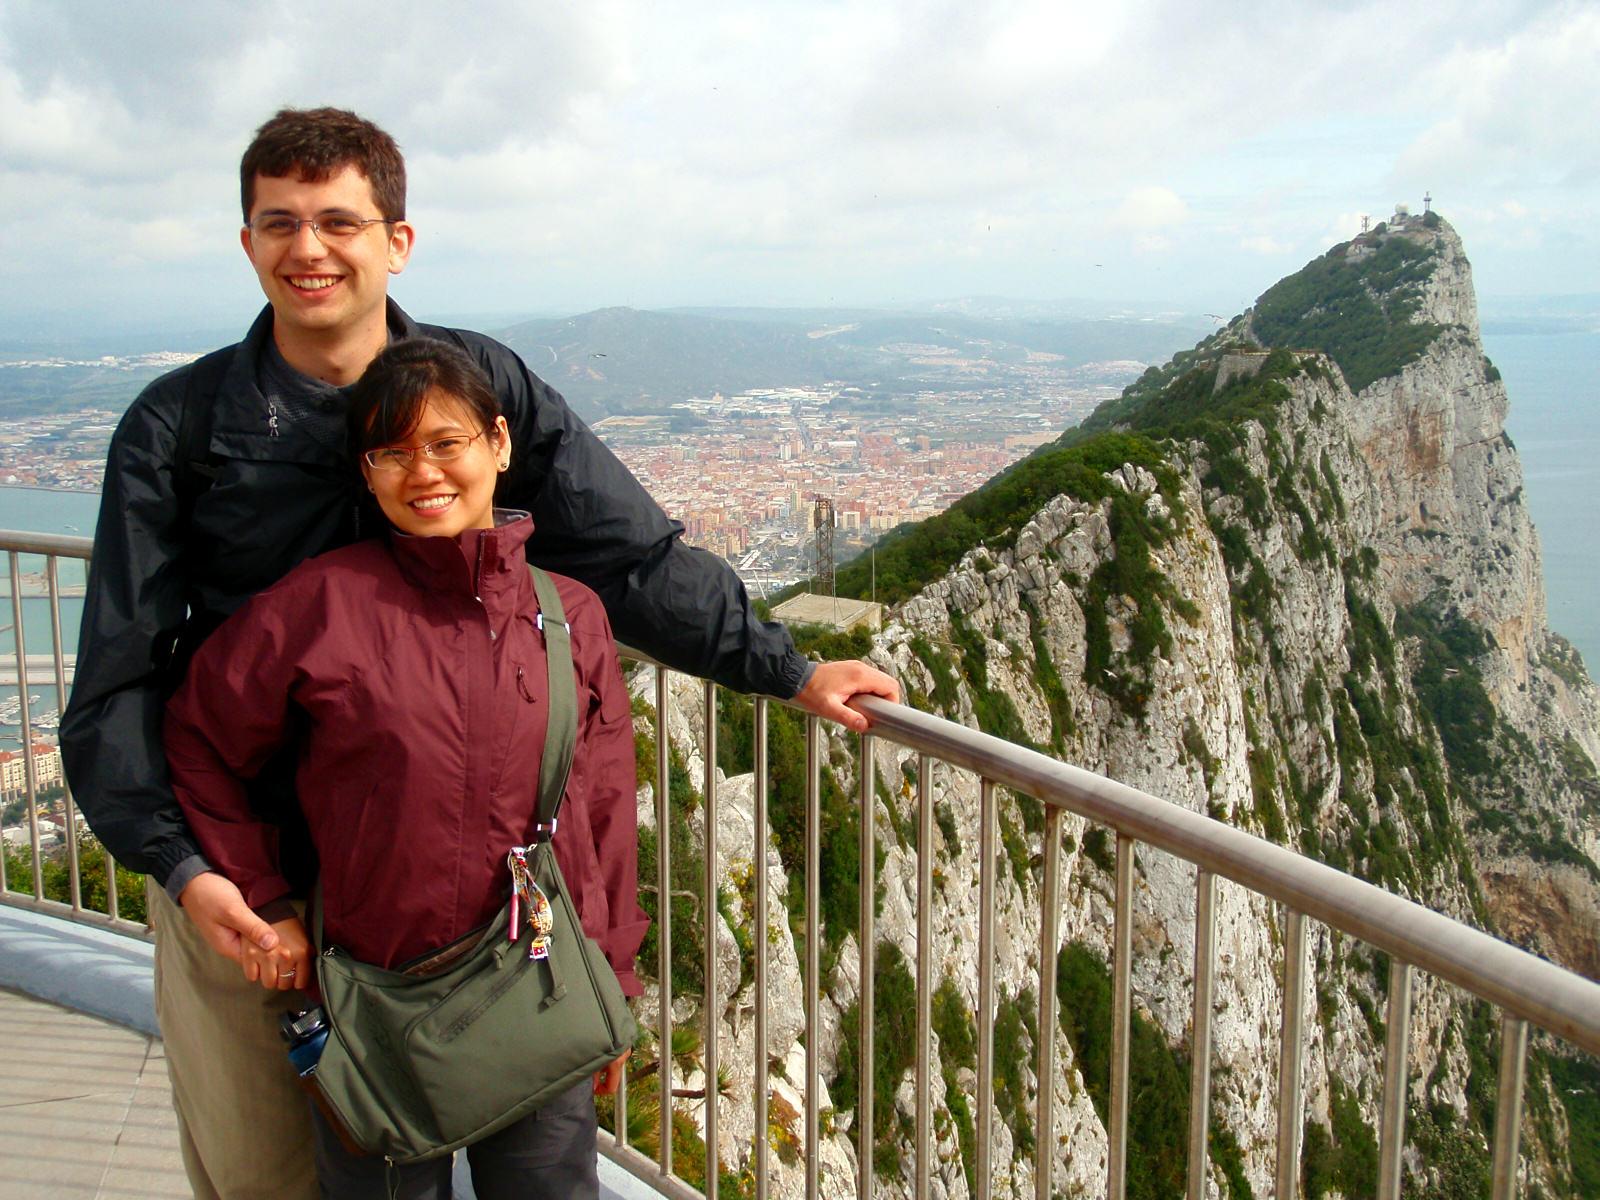 http://www.duaransel.com/wp-content/uploads/2011/07/Gibraltar.jpg